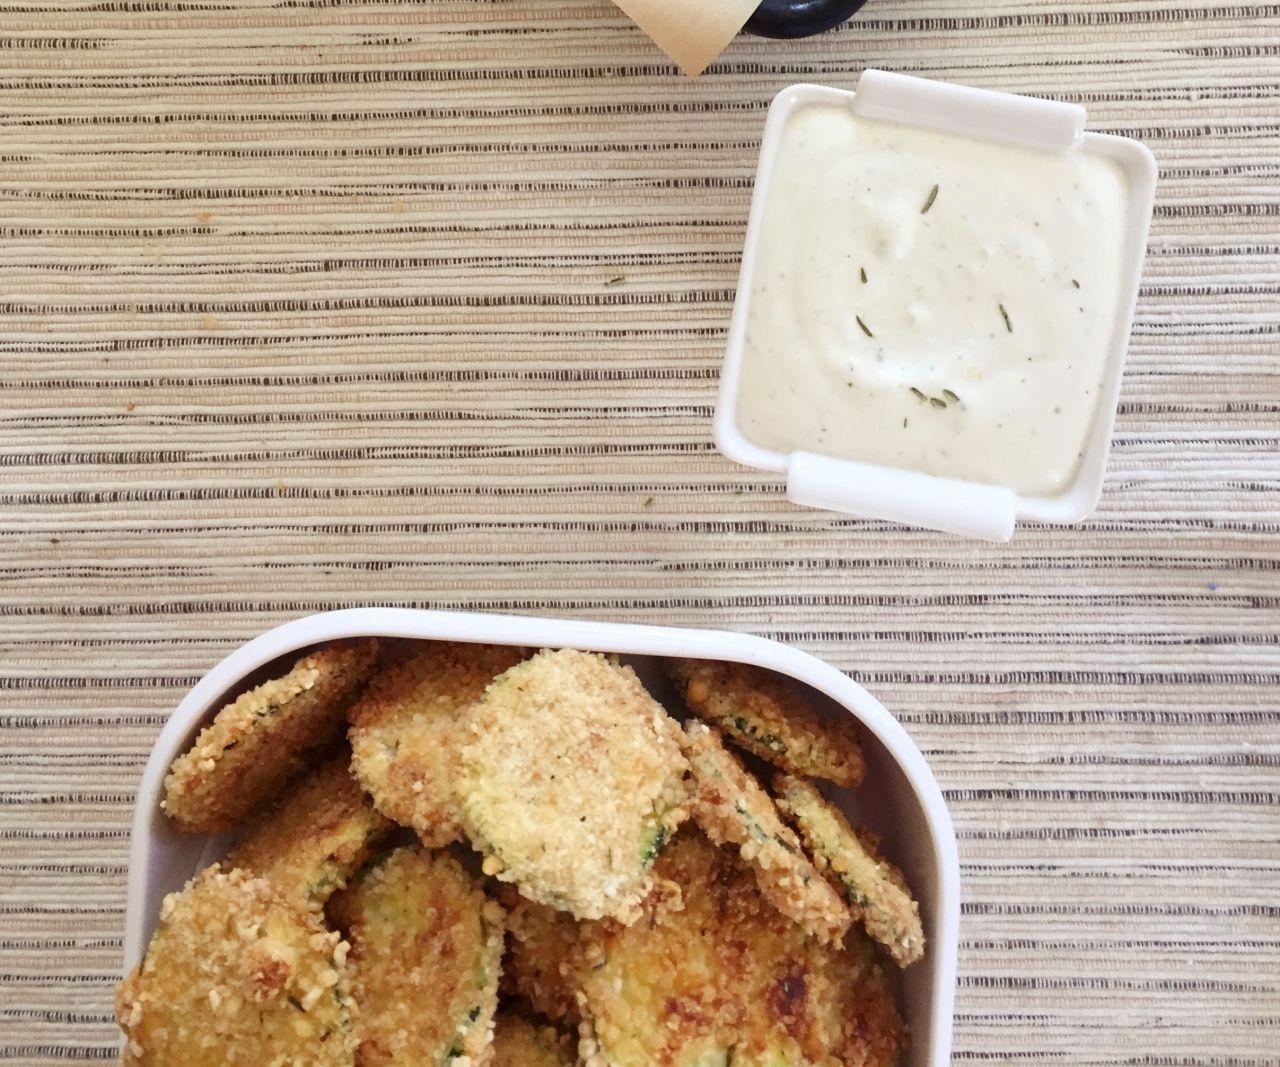 Zucchini Parmesan Chips With Feta Sauce (gluten Free)